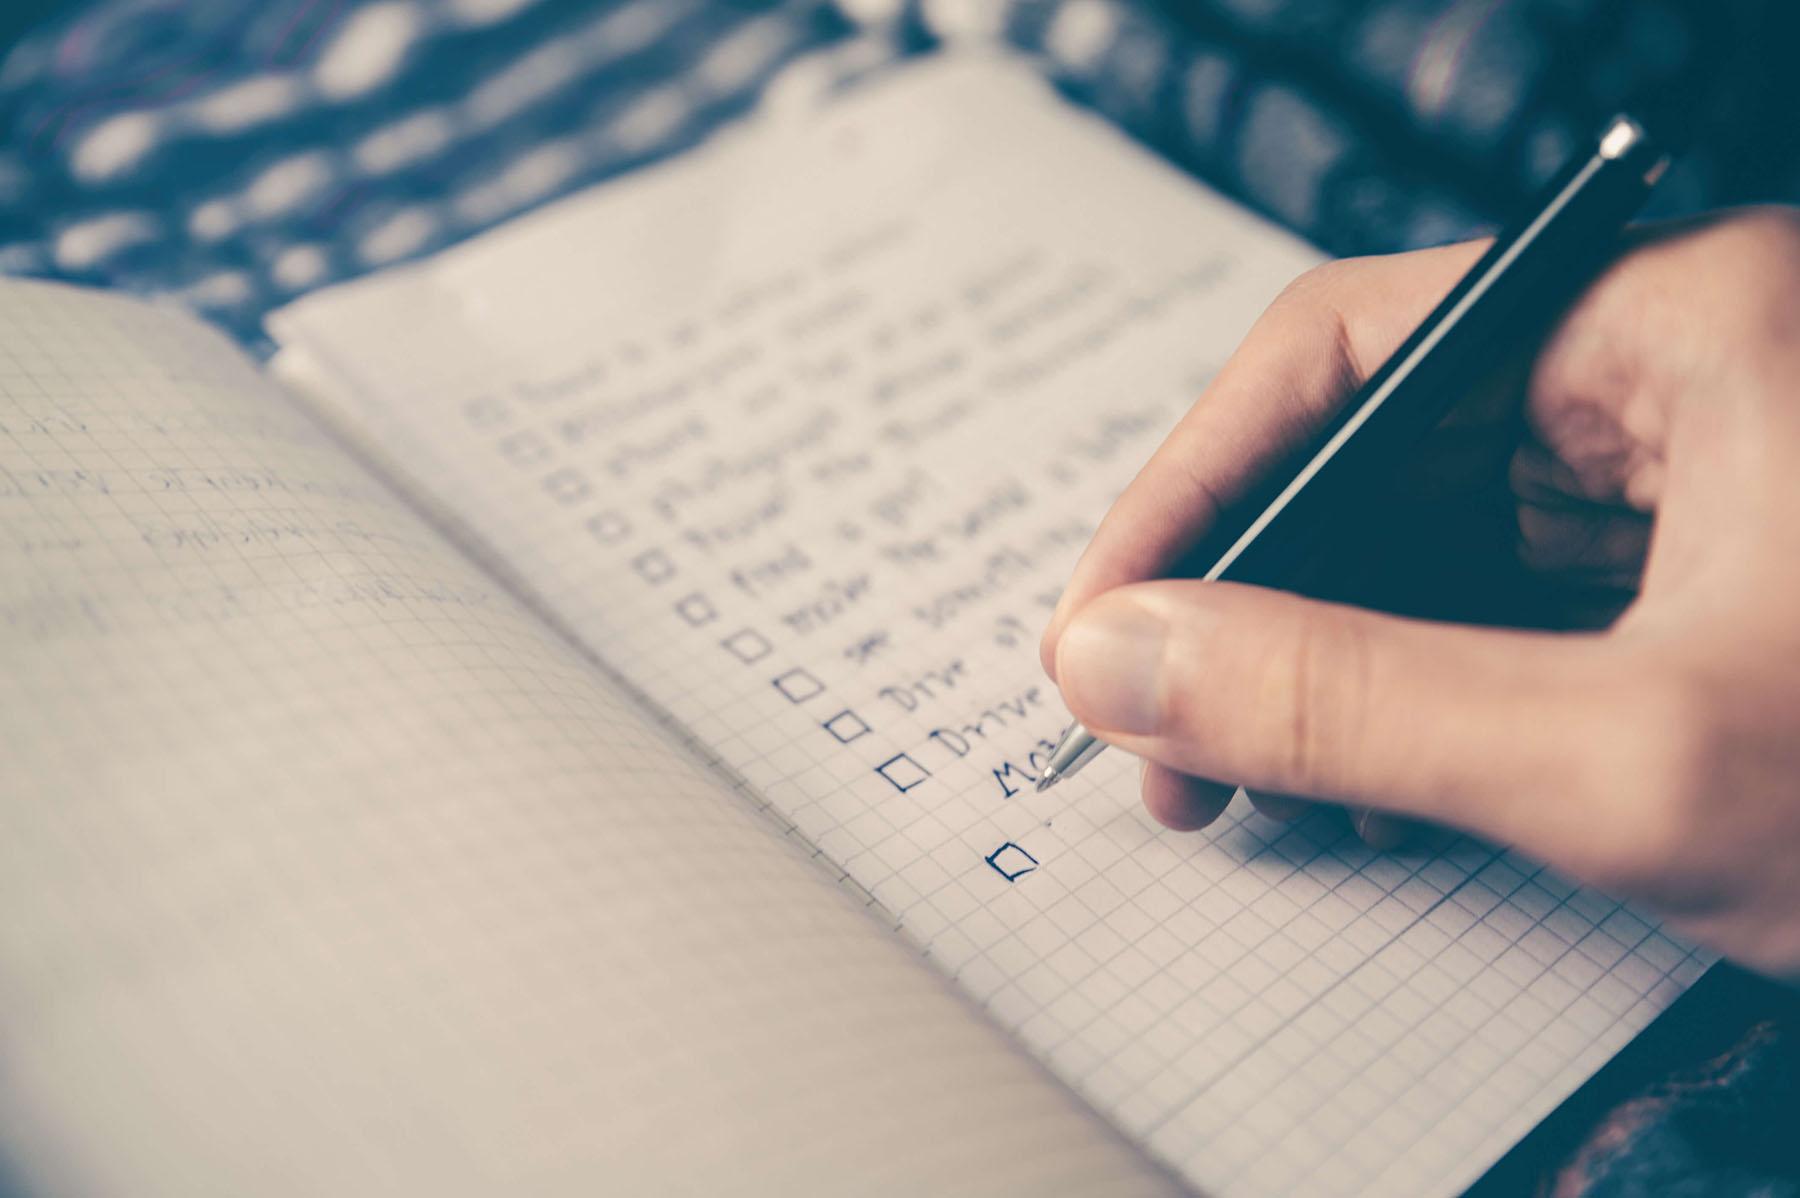 limelight-marketing-content-audit-blog-1